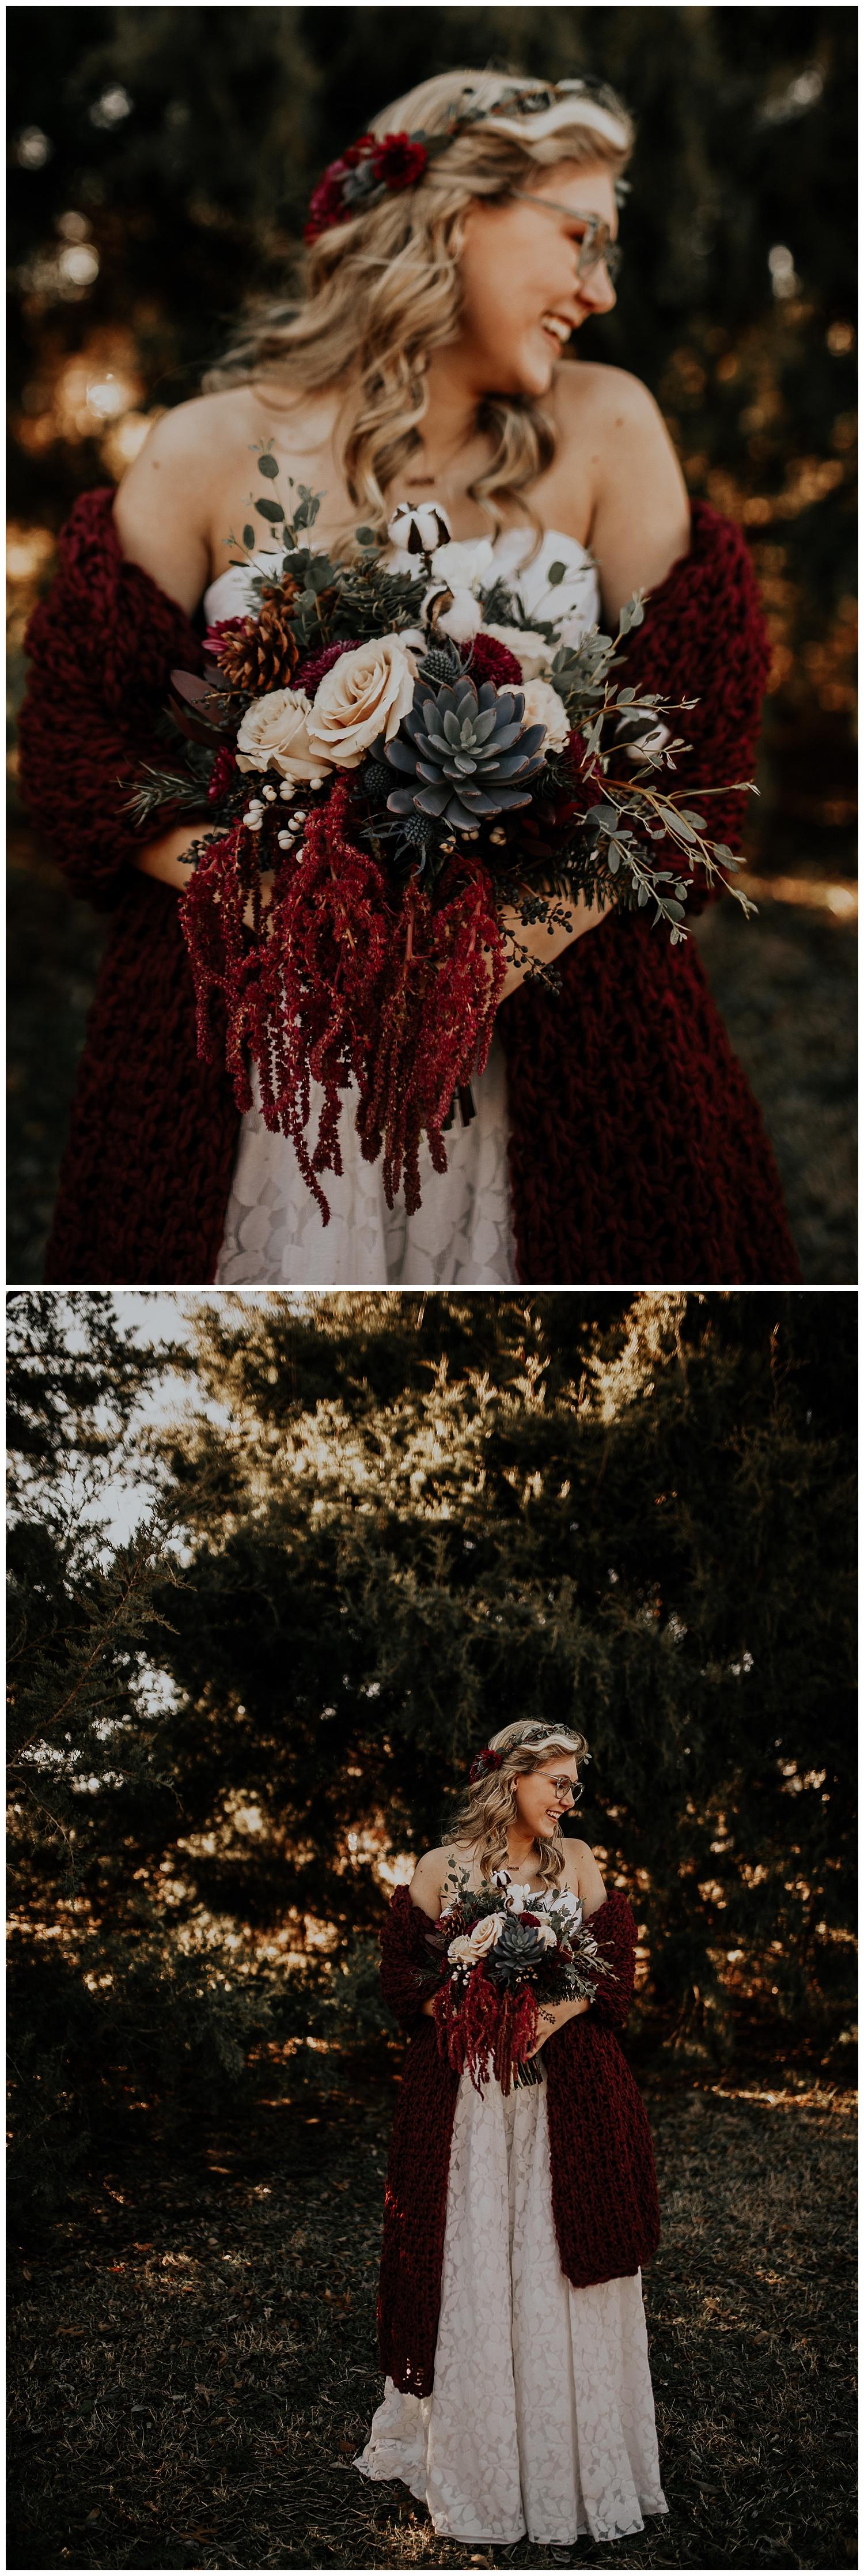 Laken-Mackenzie-Photography-Brownlee-Bridal-Session-Dallas-Fort-Worth-Wedding-Photographer05.jpg